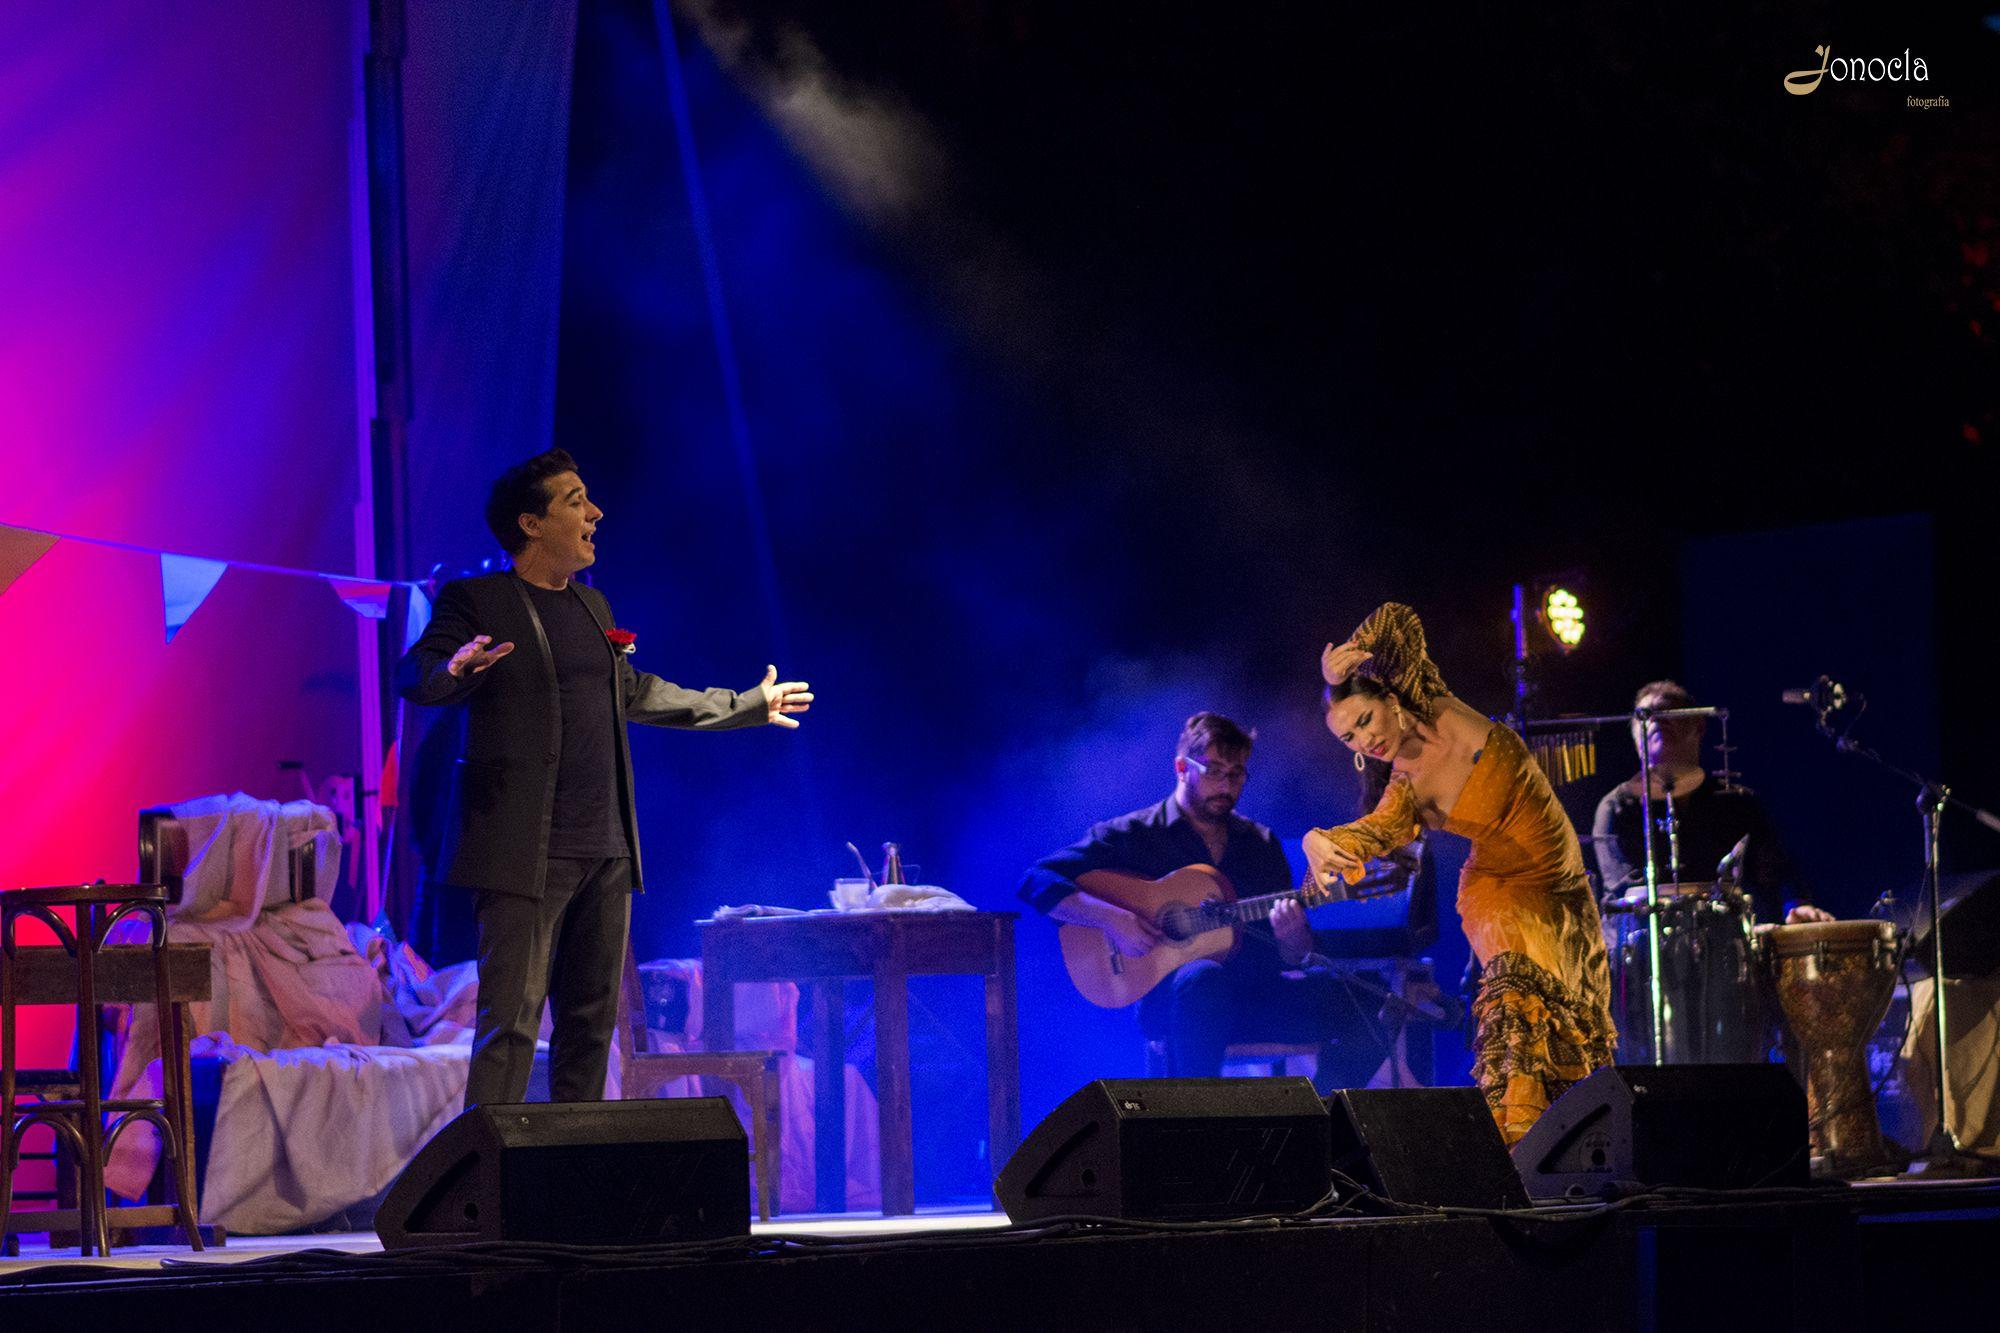 Juan Valderrama en concierto, Jerez, 17 AGO 2016   Jonocla Fotografía para MIRA Jerez